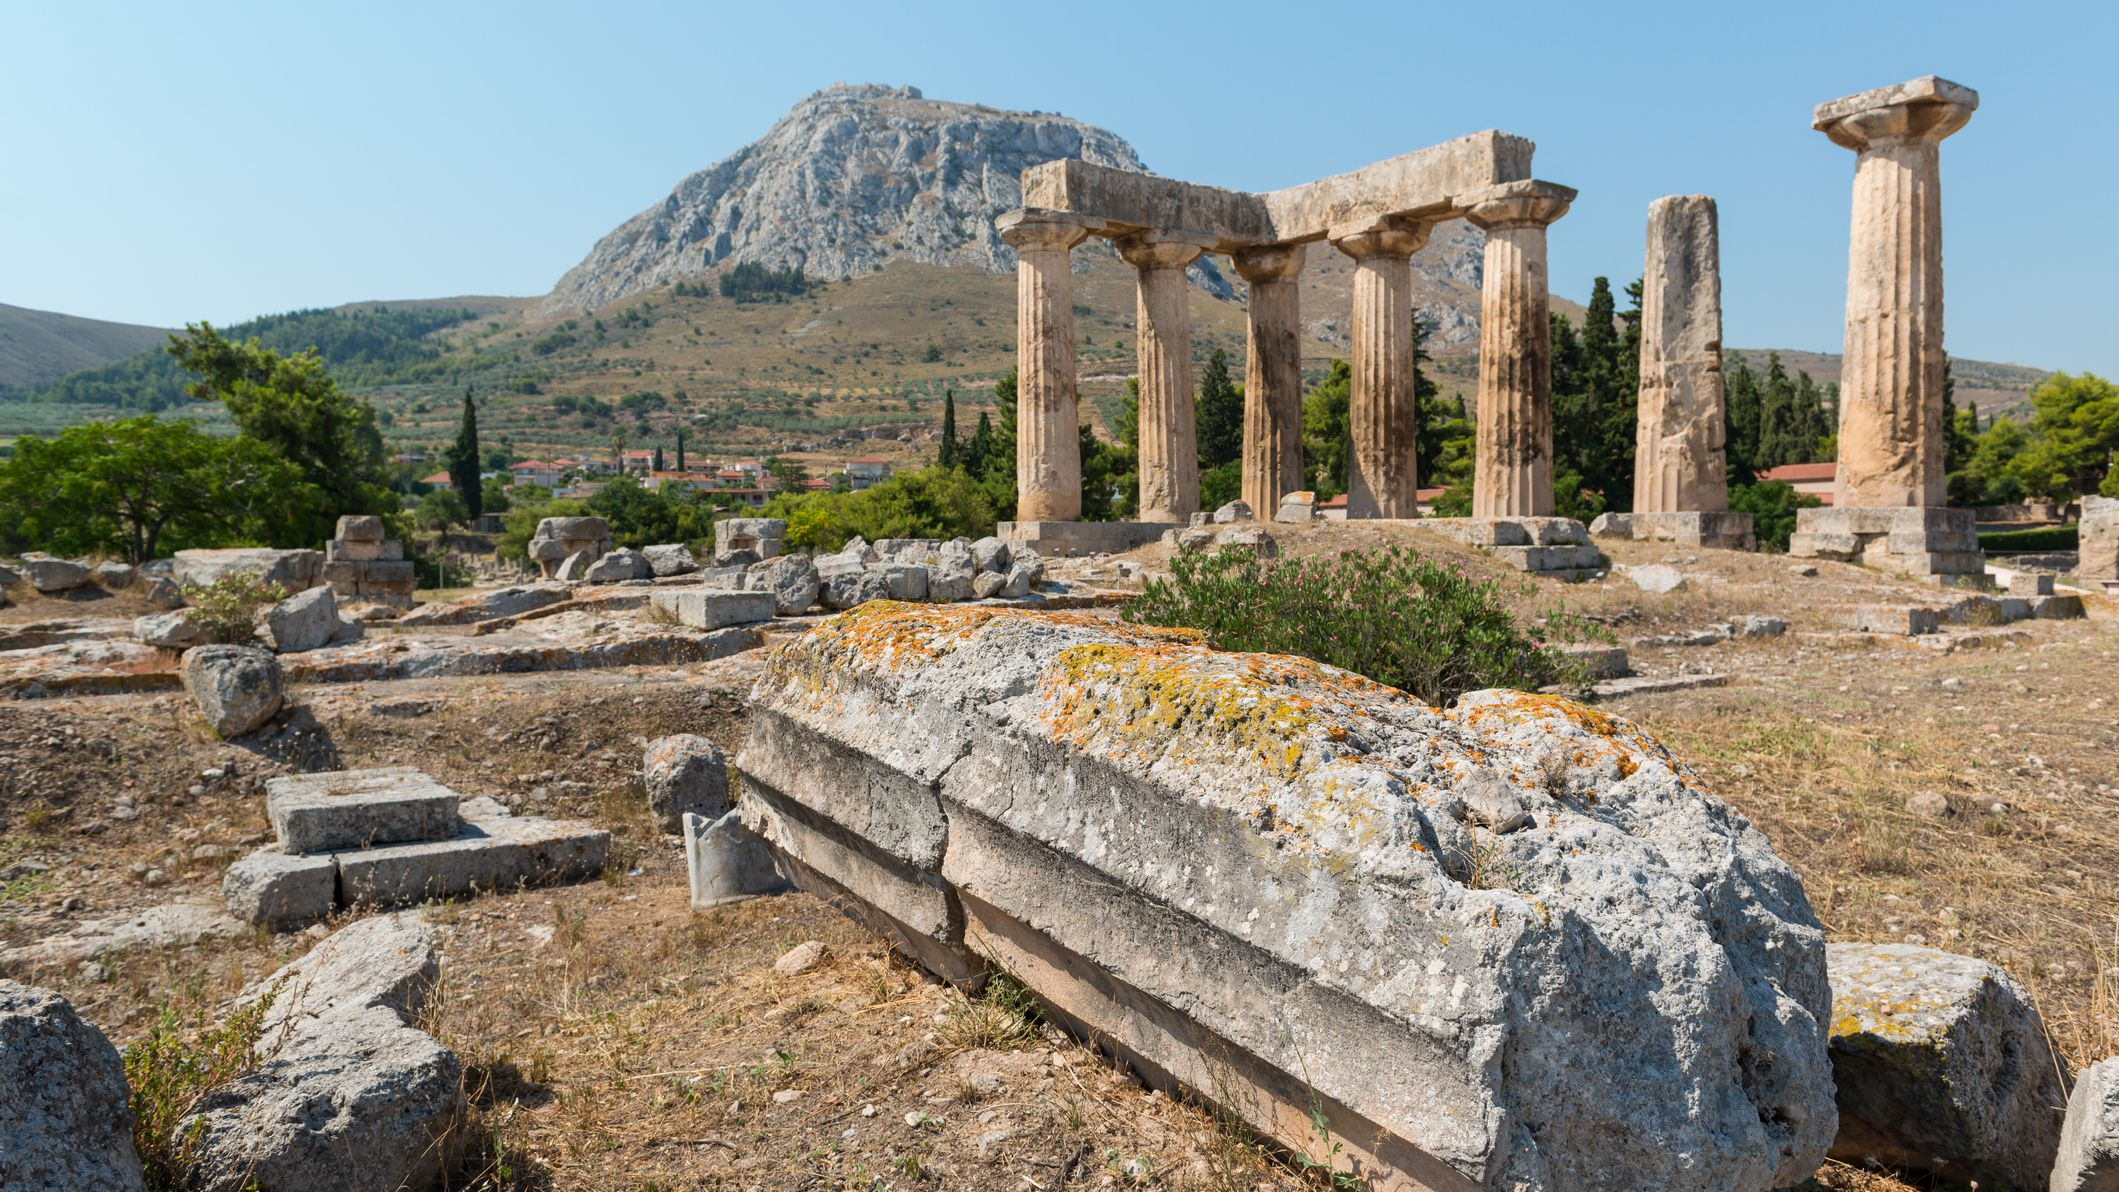 Corinth: History, Legends, and Cultural Advances